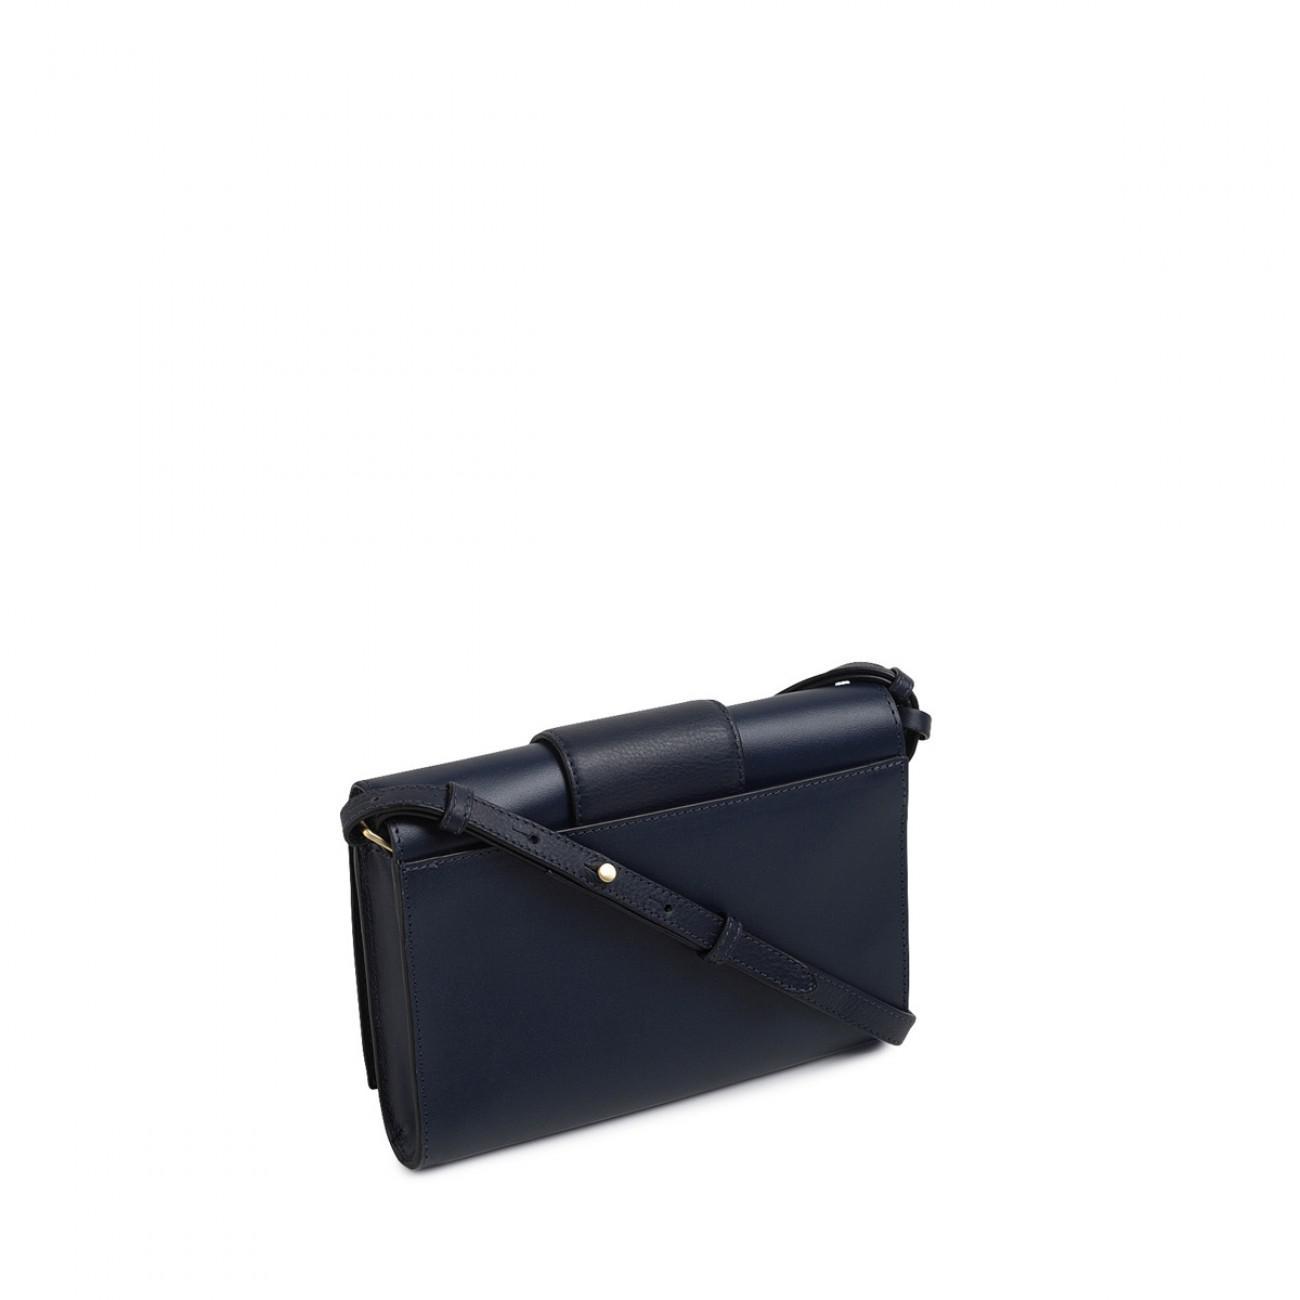 cdcecc8ec53b8 Radley Palace Street Small Flapover Cross Body Bag in Blue - Lyst